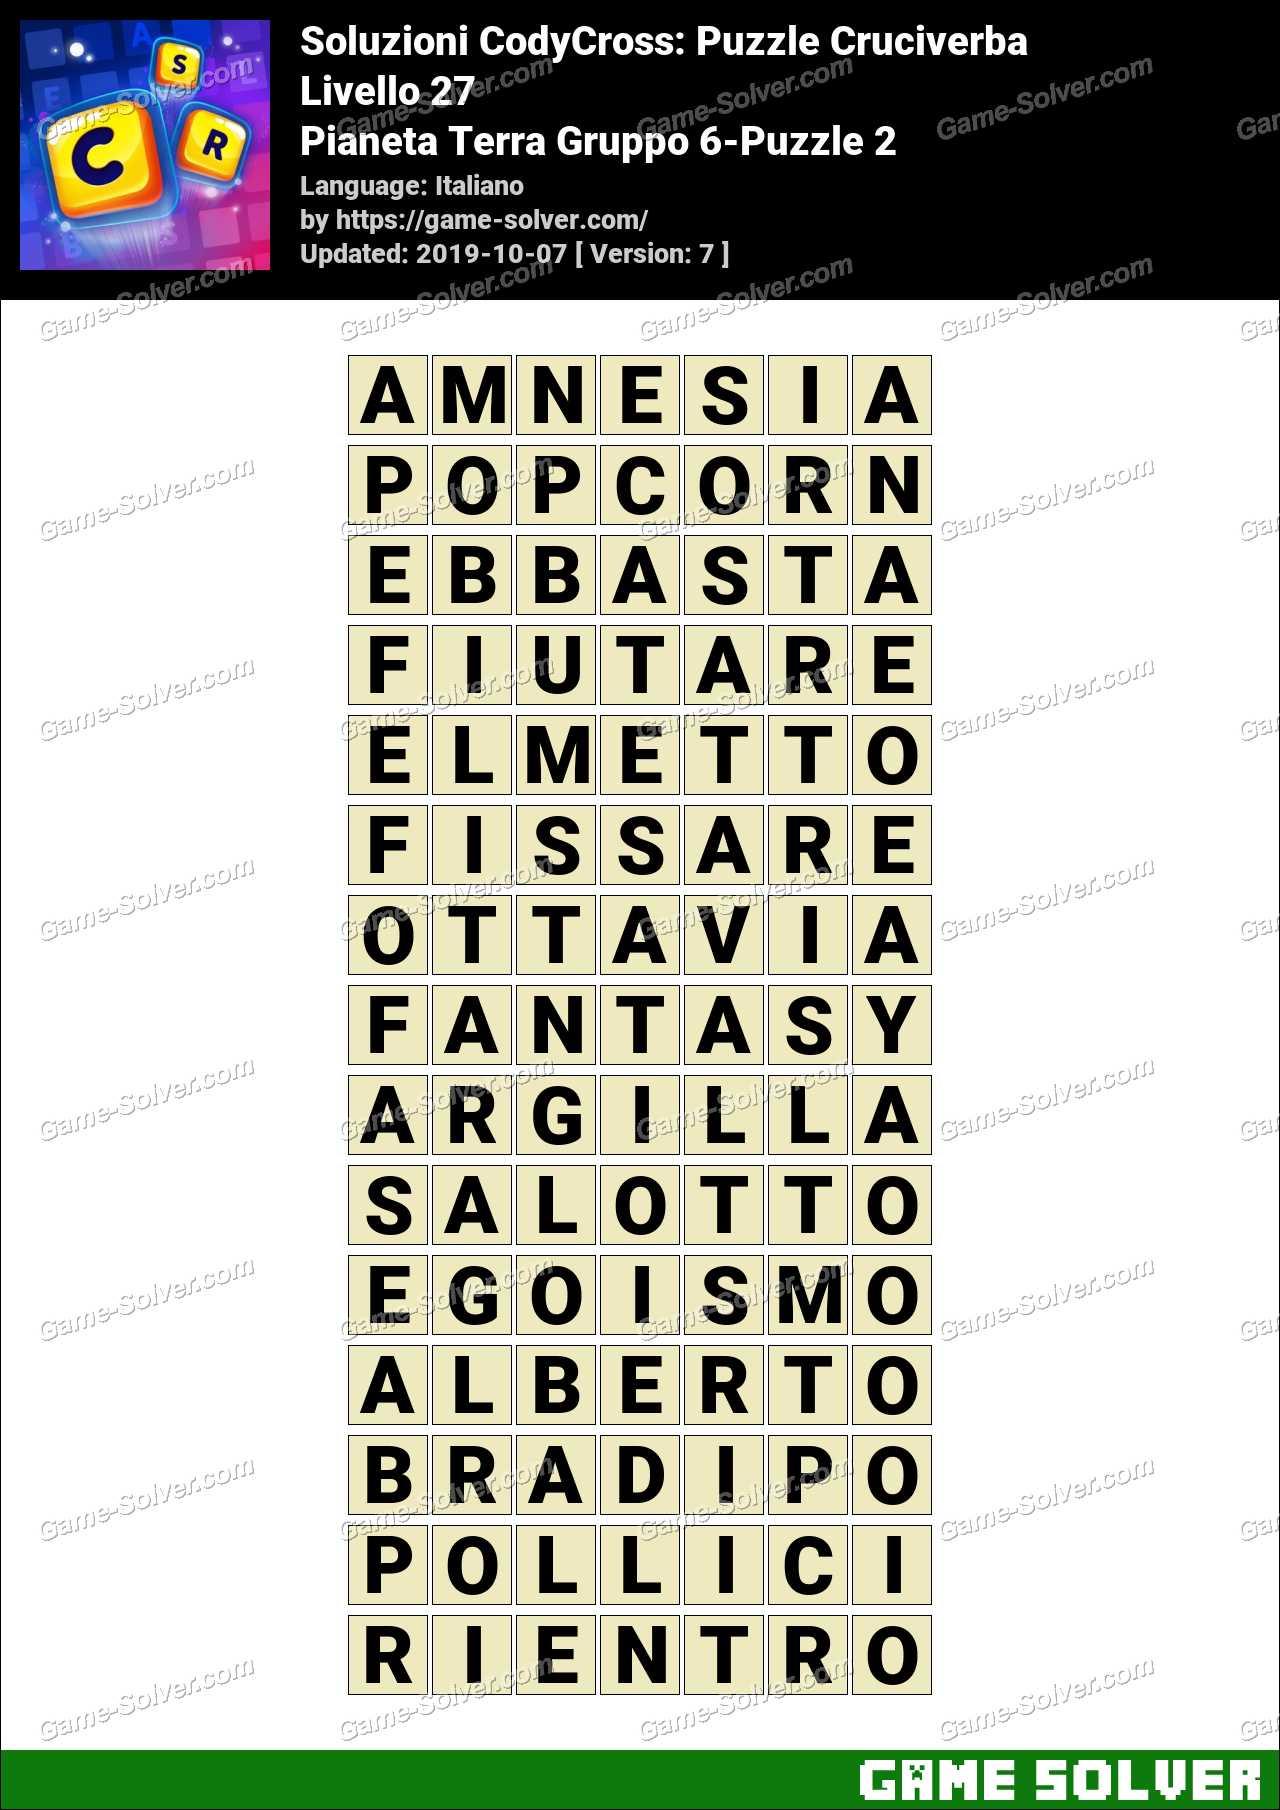 Soluzioni CodyCross Pianeta Terra Gruppo 6-Puzzle 2